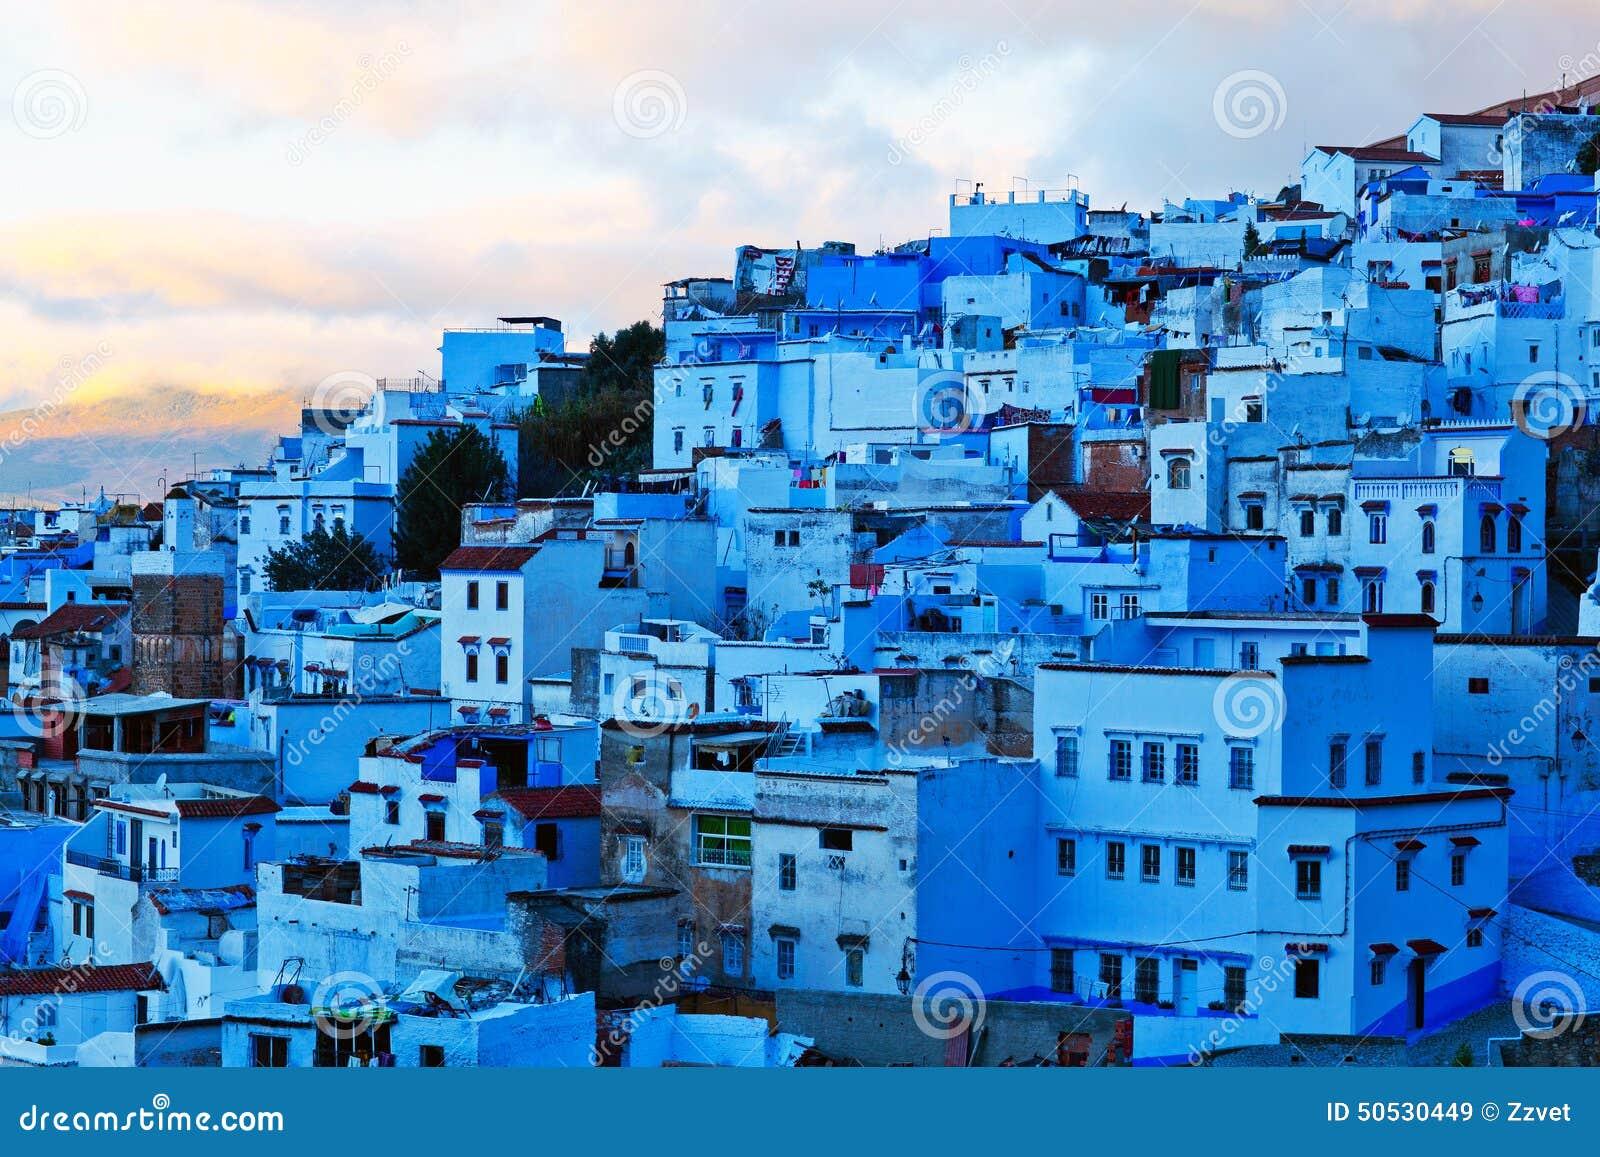 Blue City Morocco Medina Of Chefchaouen Morocco Stock Photo Image 50530449